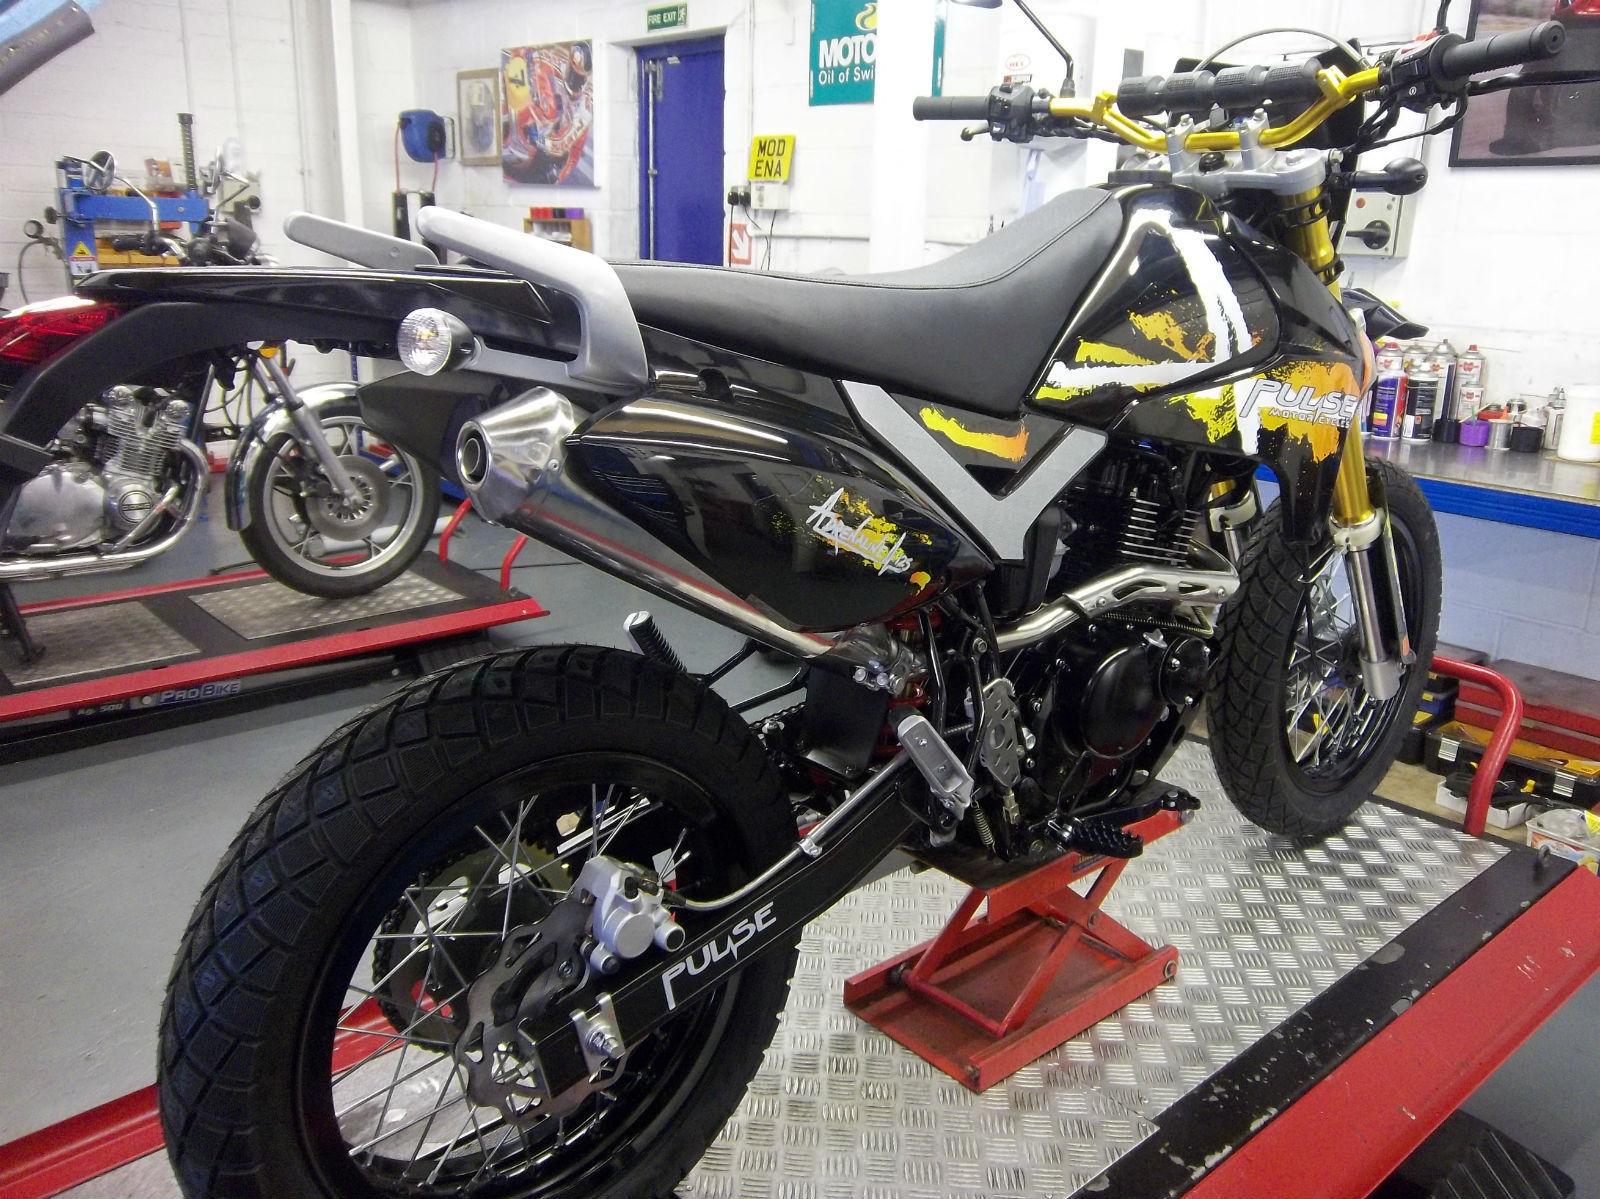 125 250 cc: